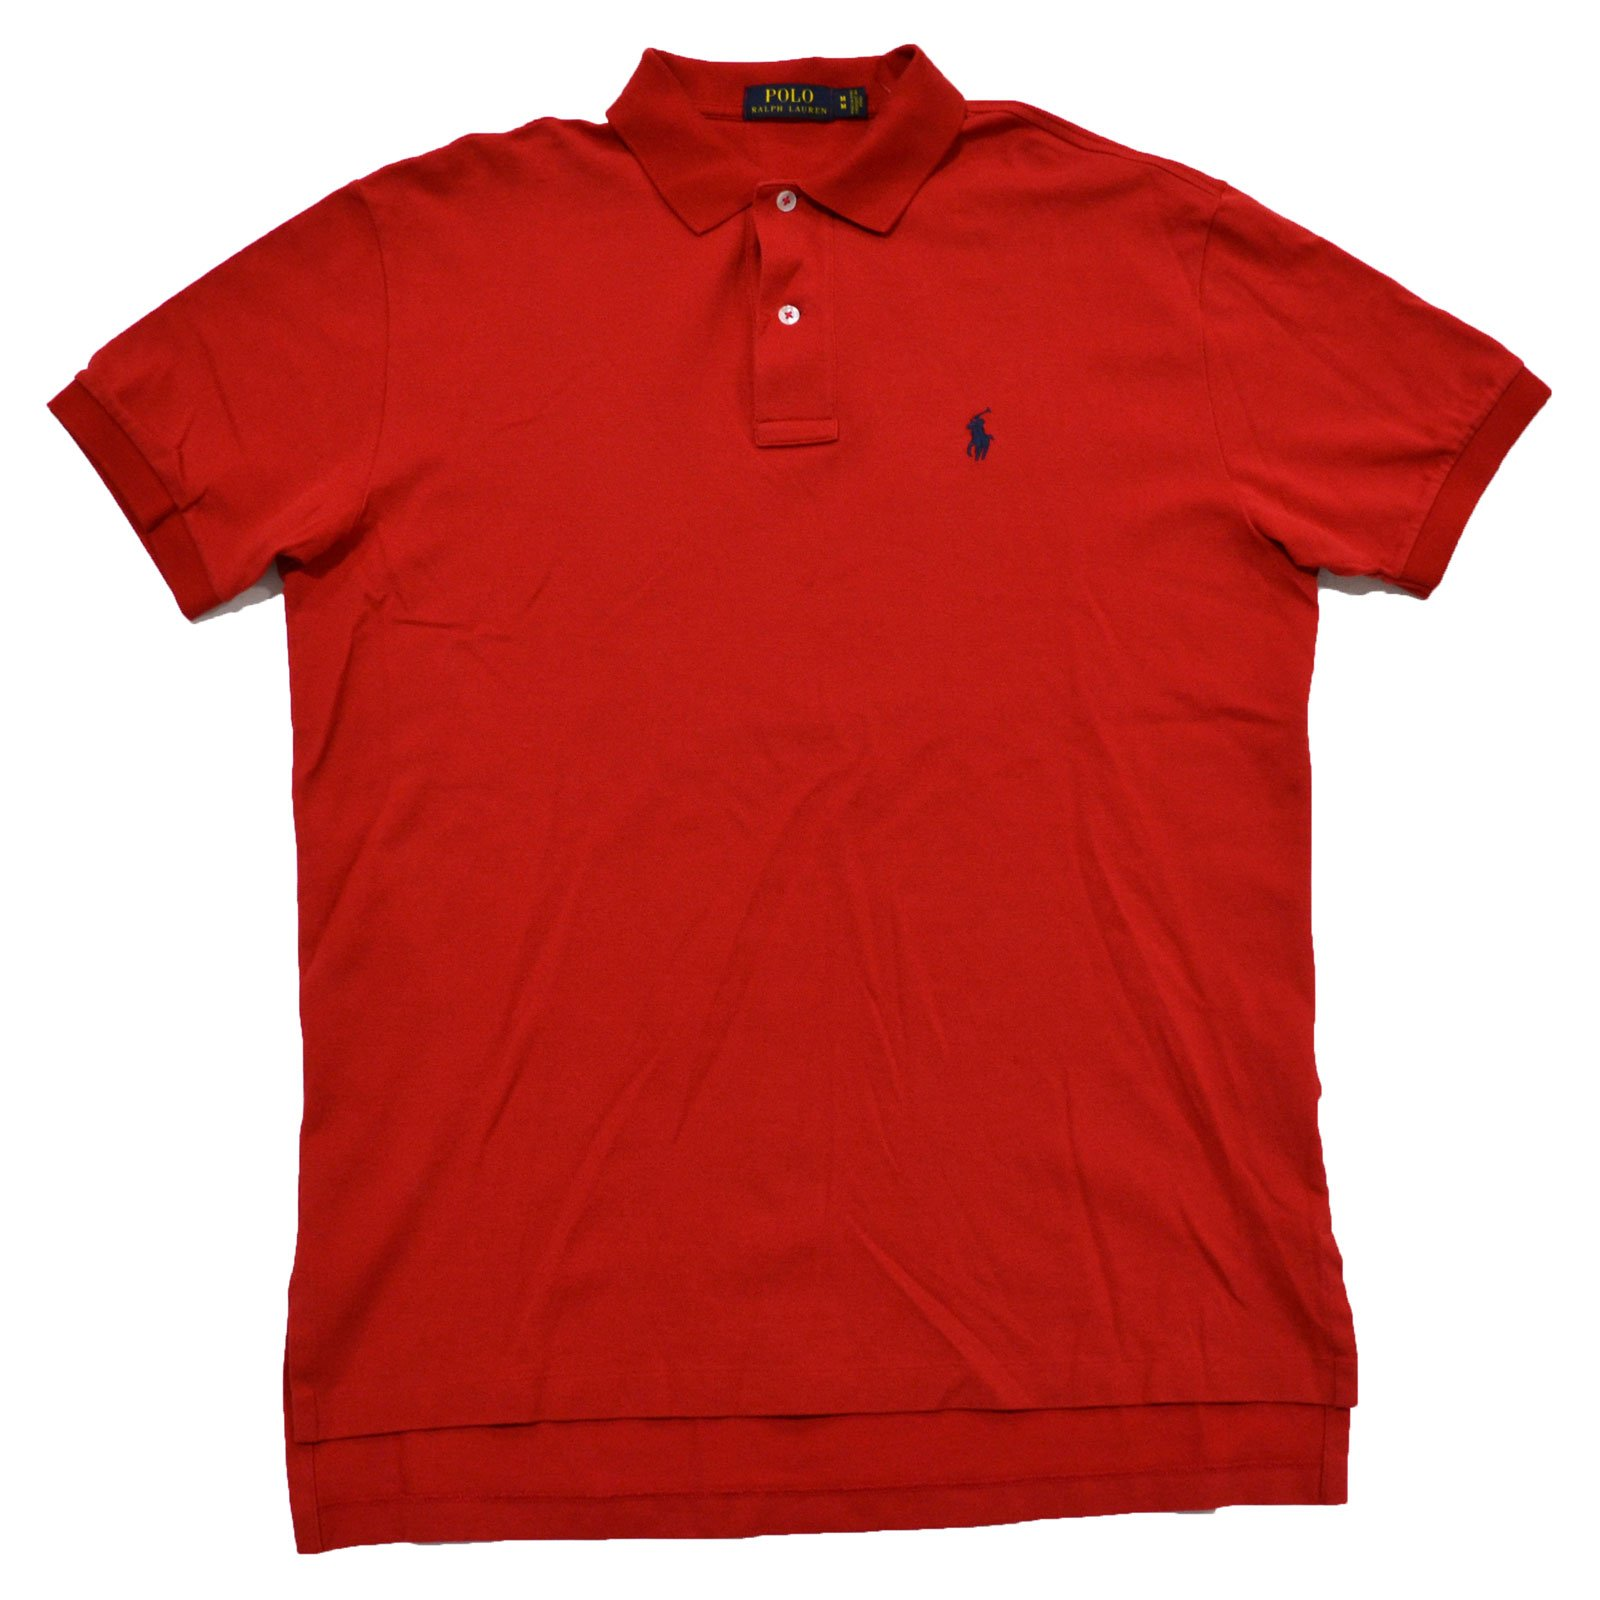 763dede392 Polo Ralph Lauren Men Classic Fit Mesh - TiendaMIA.com